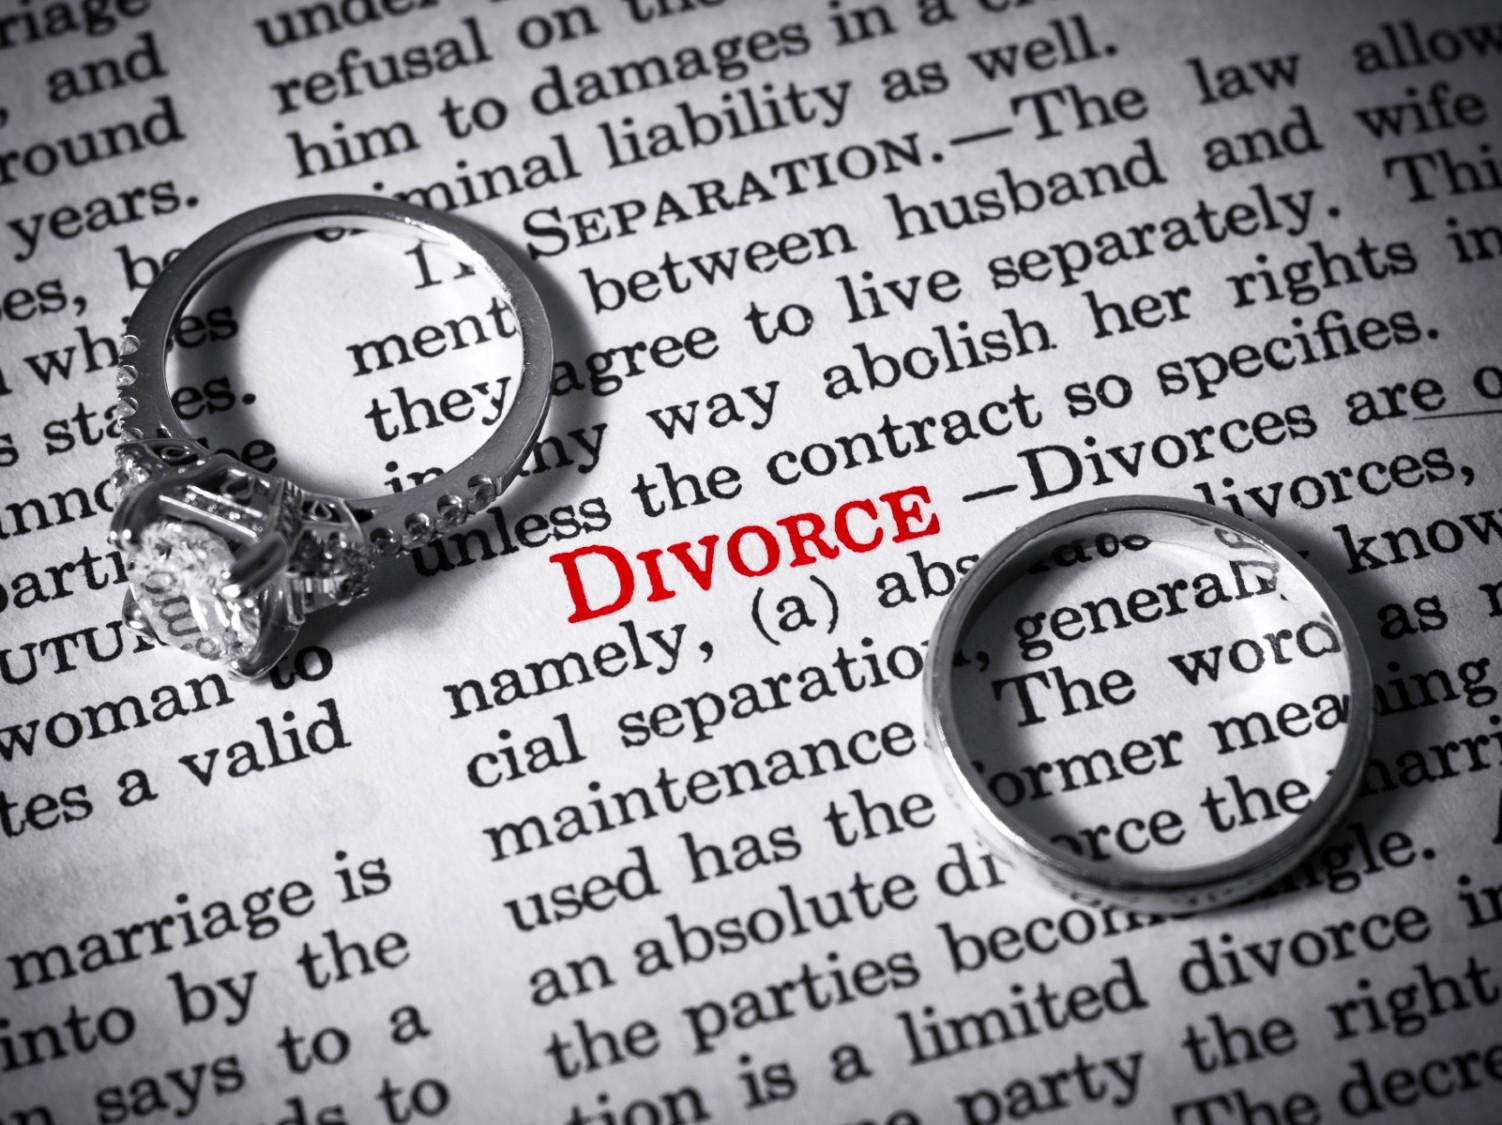 زمان مناسب طلاق